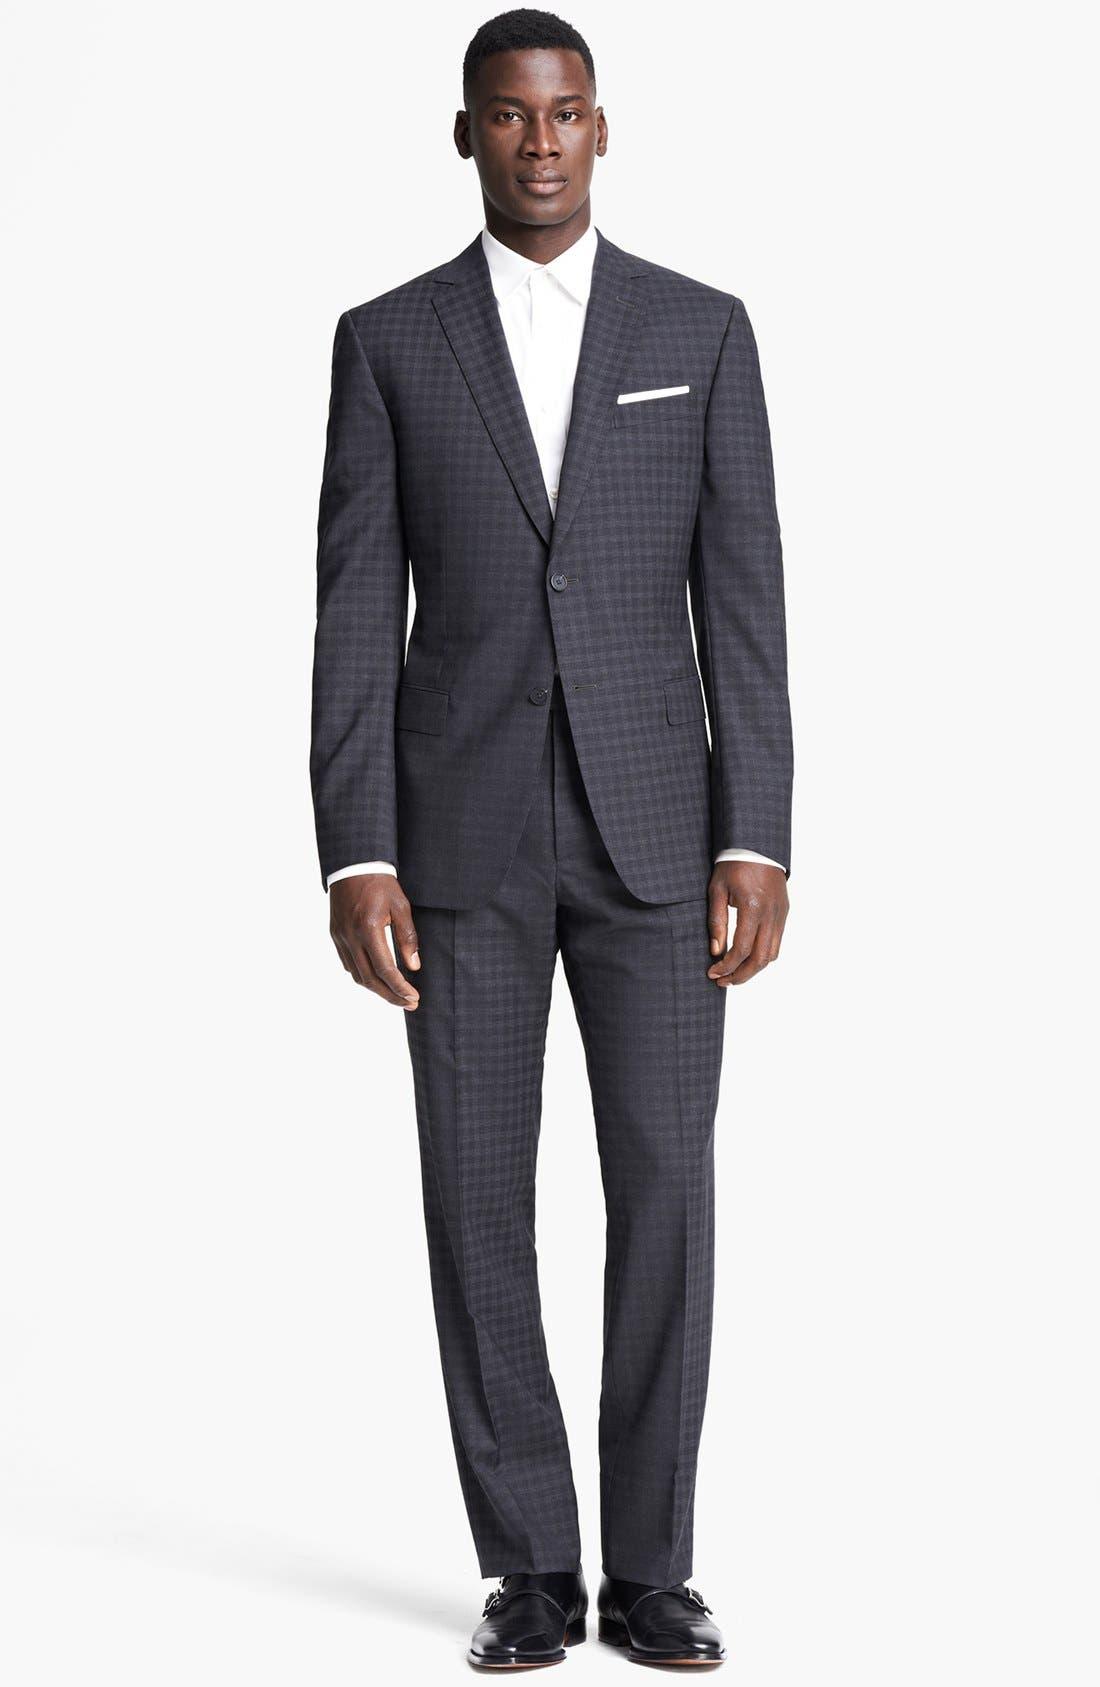 Main Image - Z Zegna 'City' Dark Grey Check Wool Suit